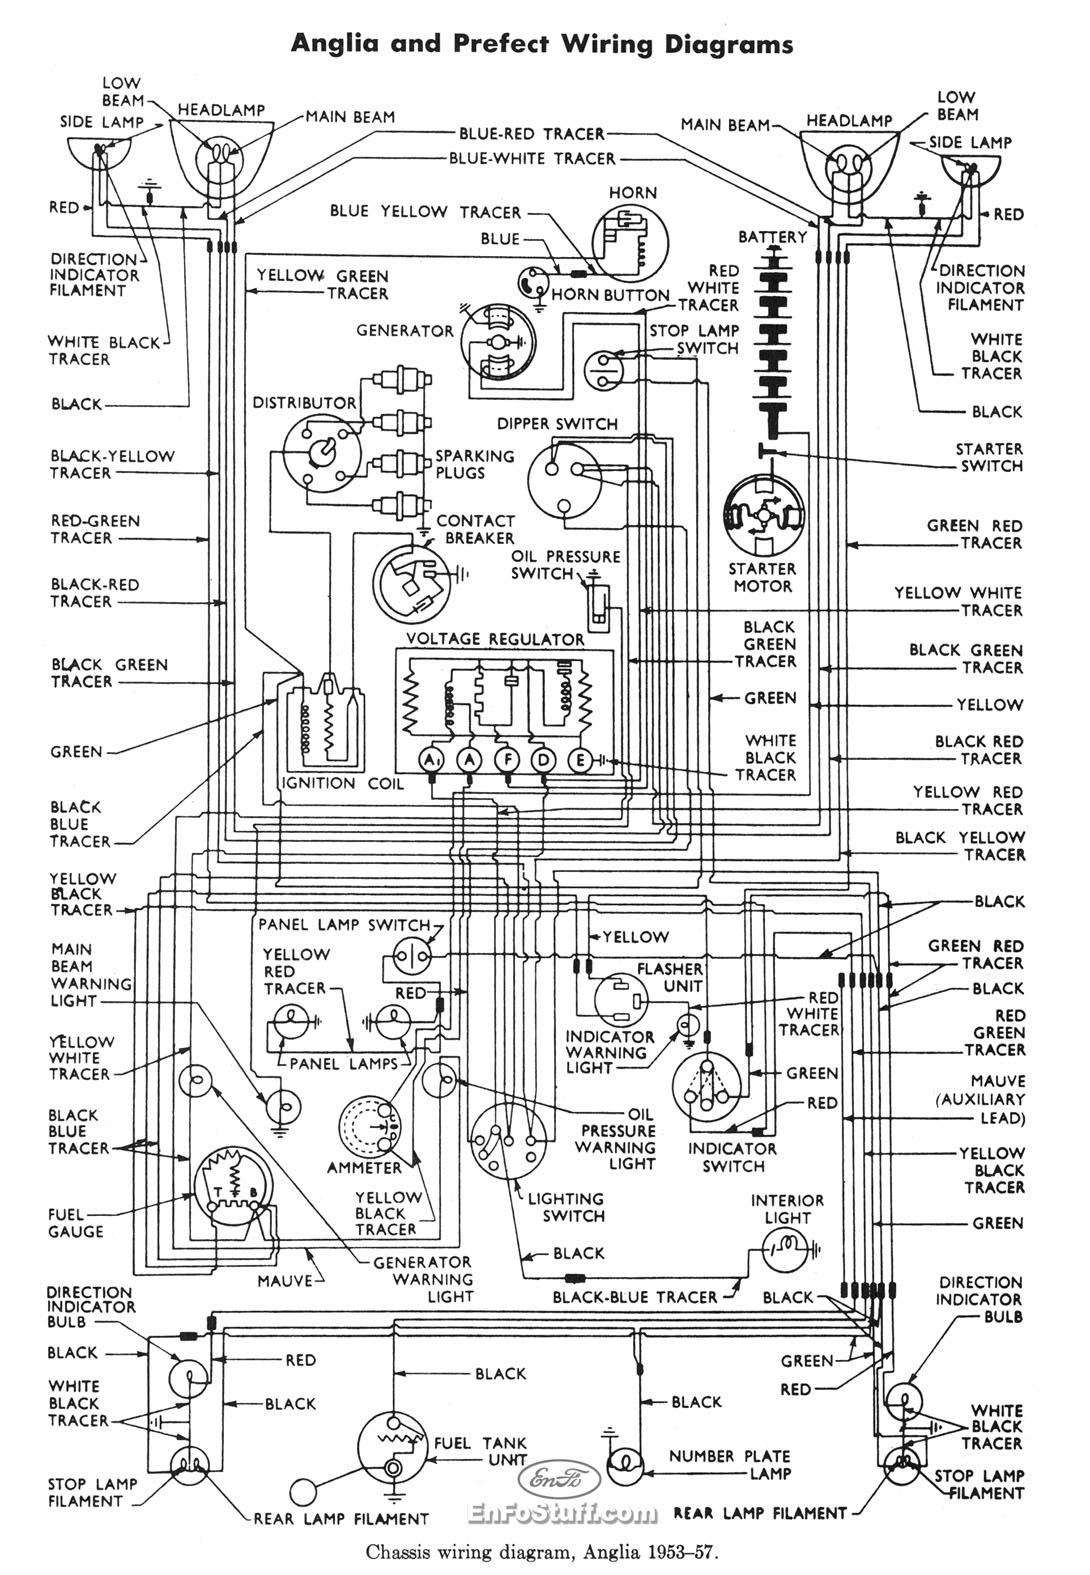 diagram] ford 7700 wiring diagram full version hd quality wiring diagram -  diagramman.i-ras.it  diagram database - i-ras.it